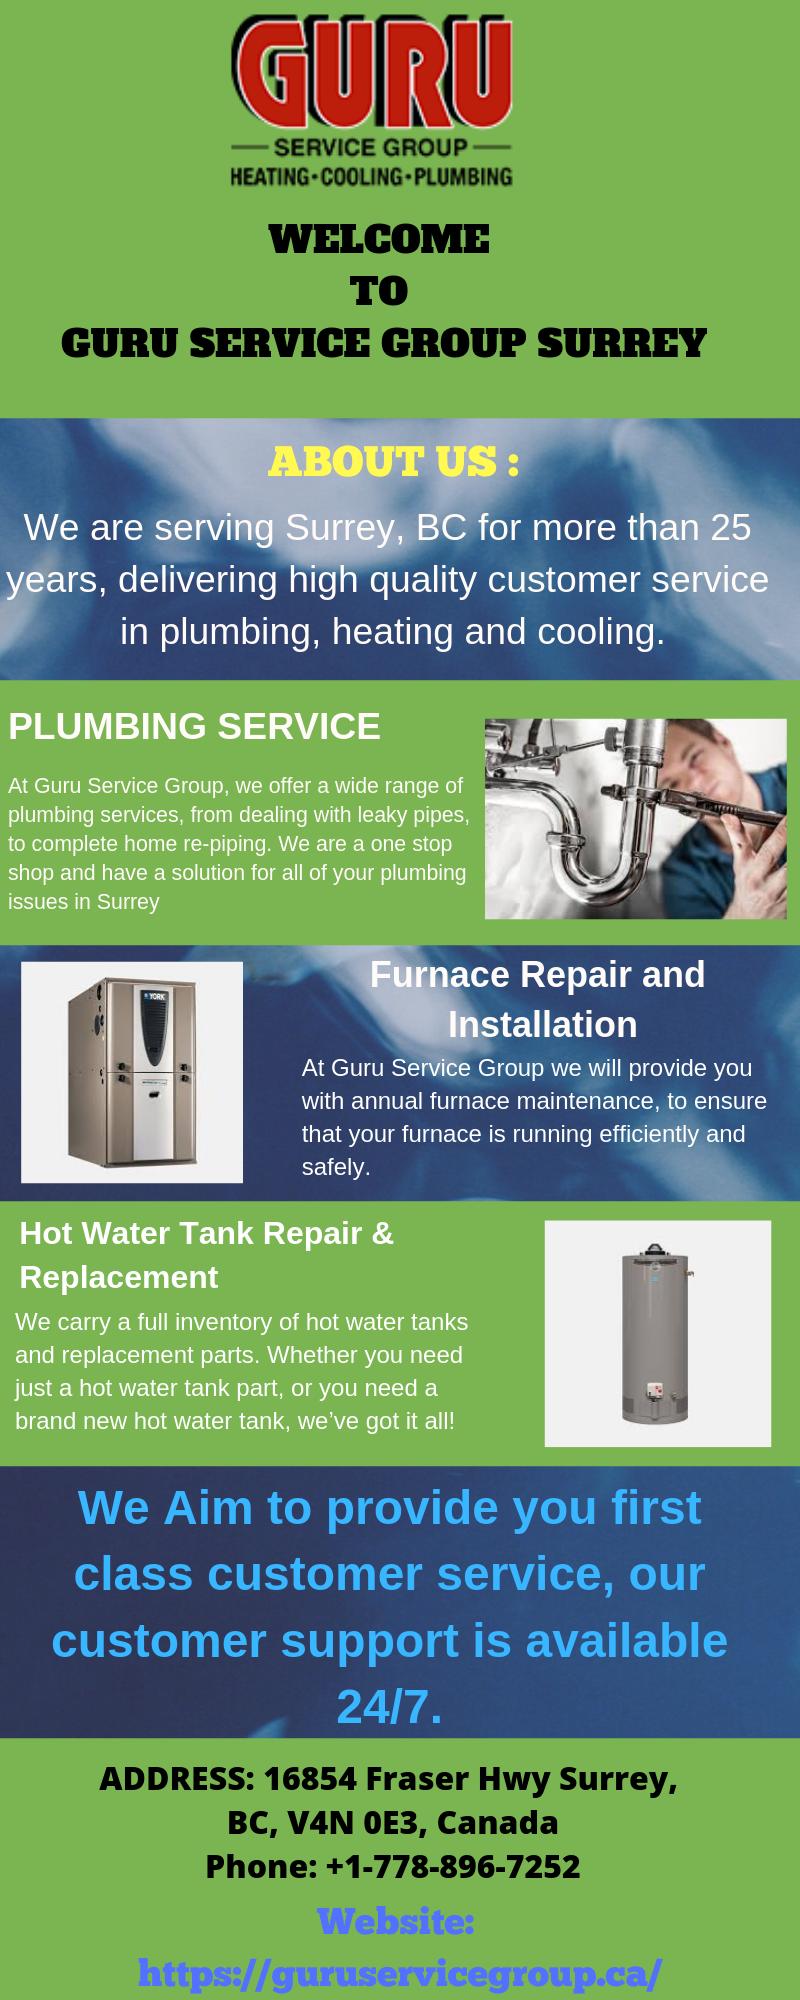 Commercial Plumbing Services Guru Service Group Surrey